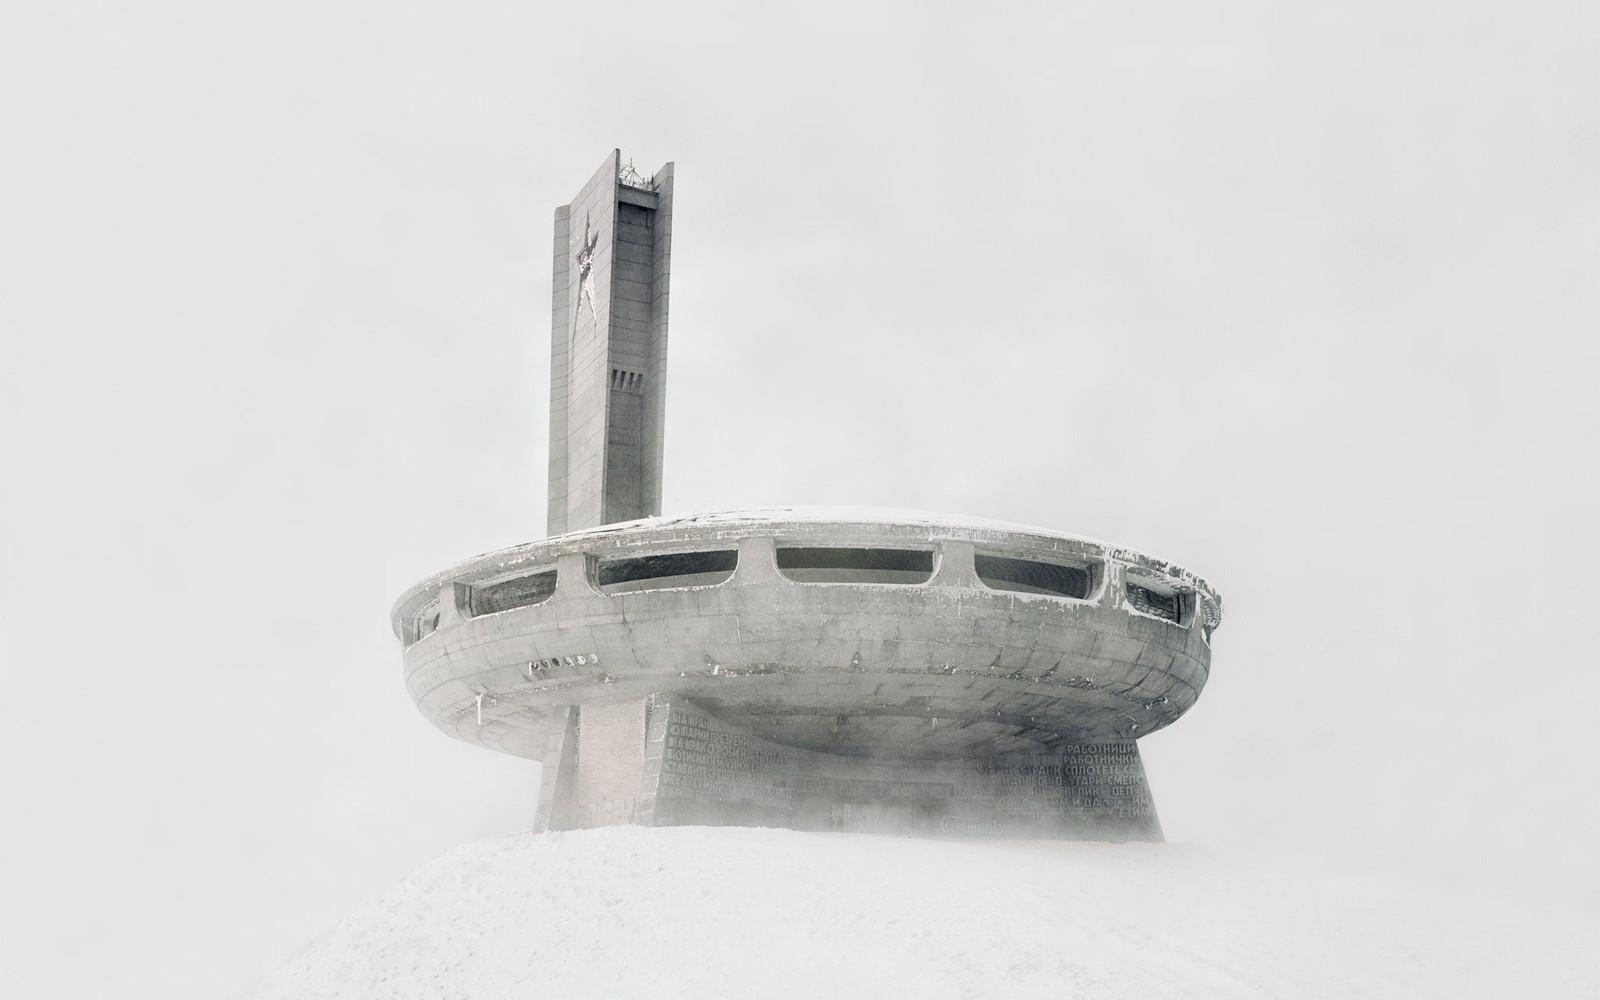 Штаб-квартира Коммунистической партии,Болгария